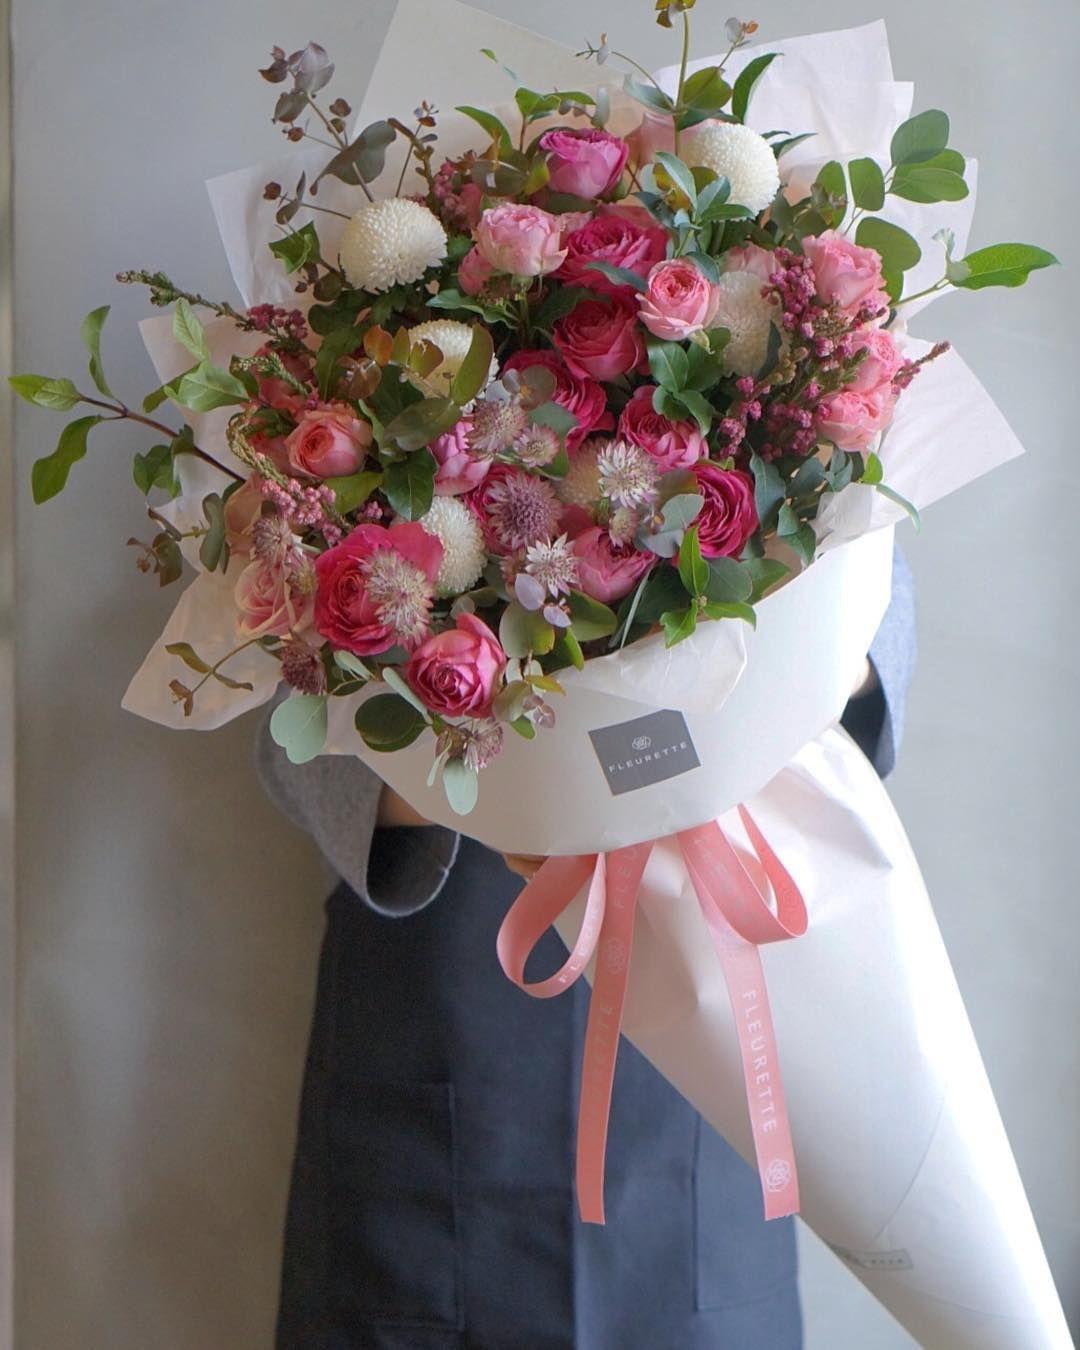 Blush Pink And Green Bridal Bouquet With Eucalyptus Wedding Flower Trends Dahlia Wedding Bouquets Dahlias Wedding